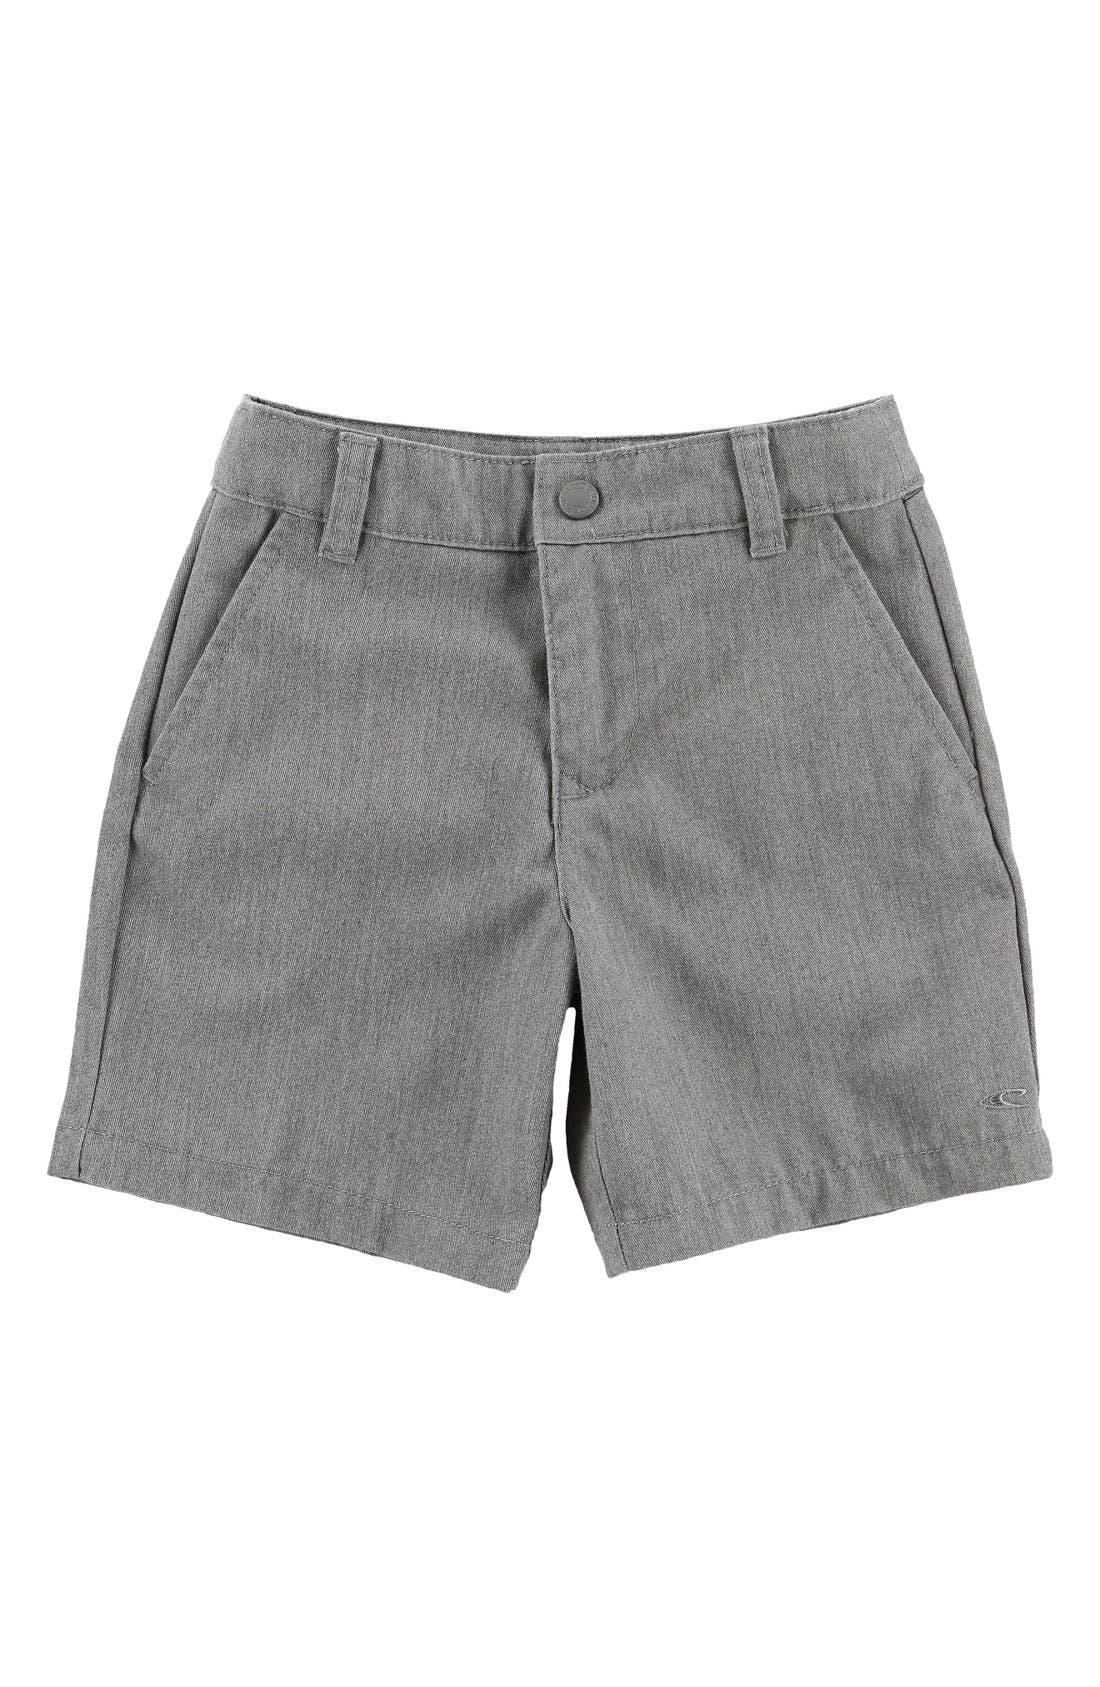 O'Neill Contact Twill Walking Shorts (Toddler Boys)